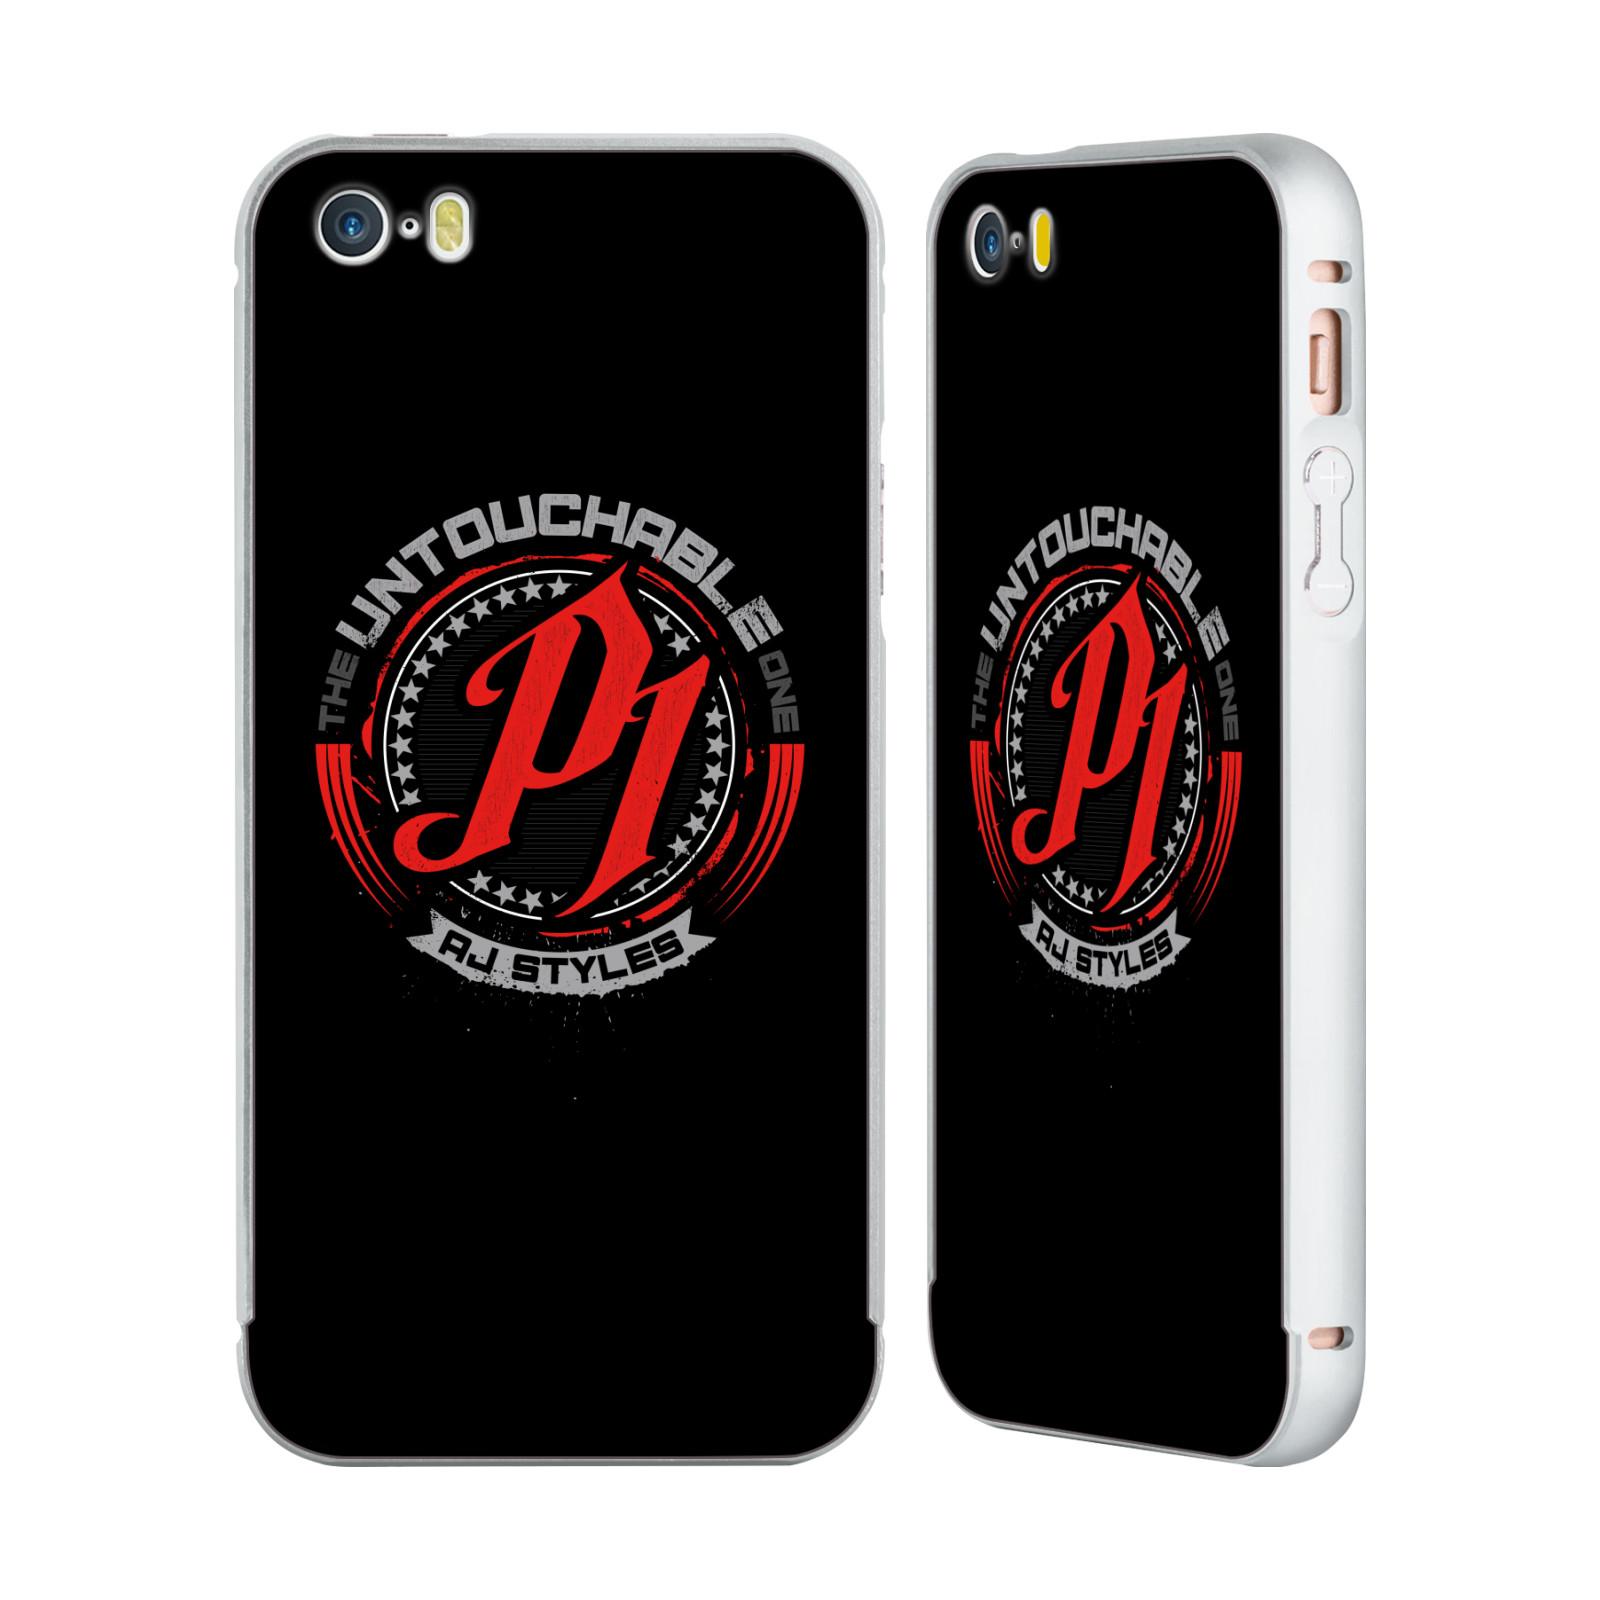 UFFICIALE-WWE-2017-AJ-STYLES-ARGENTO-COVER-CONTORNO-PER-APPLE-iPHONE-TELEFONI